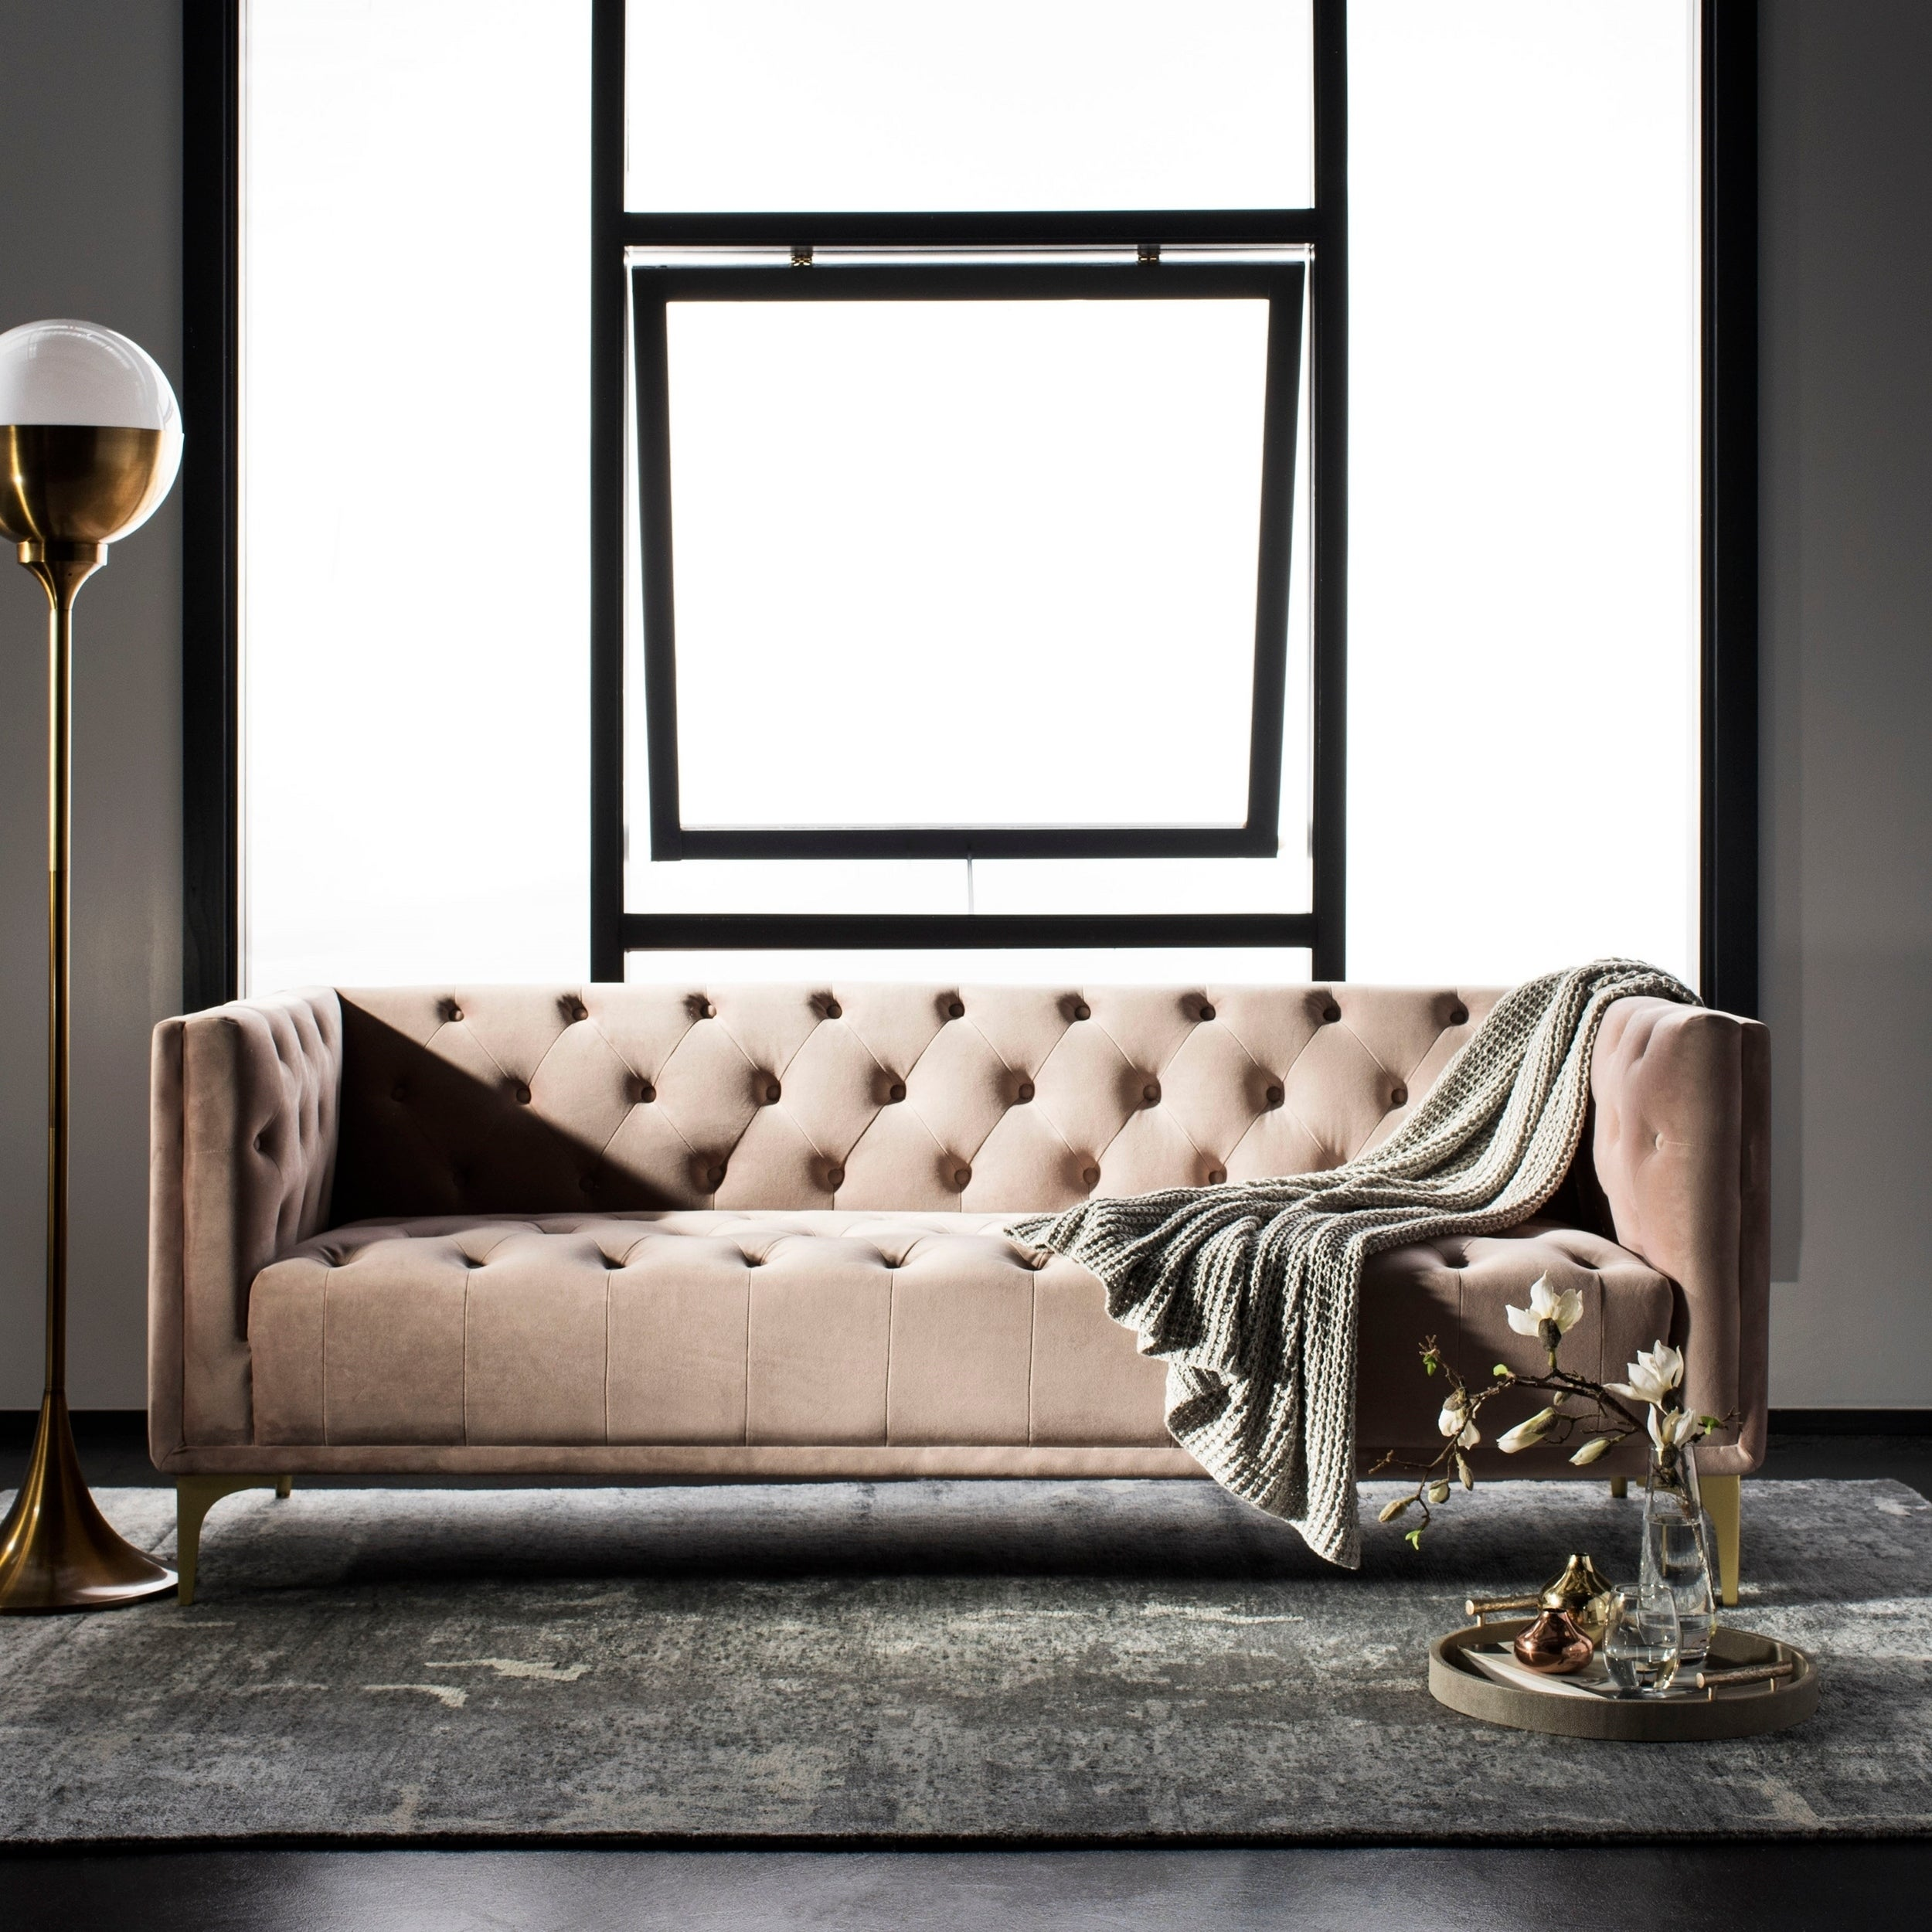 Safavieh Couture Floino Tufted Sofa